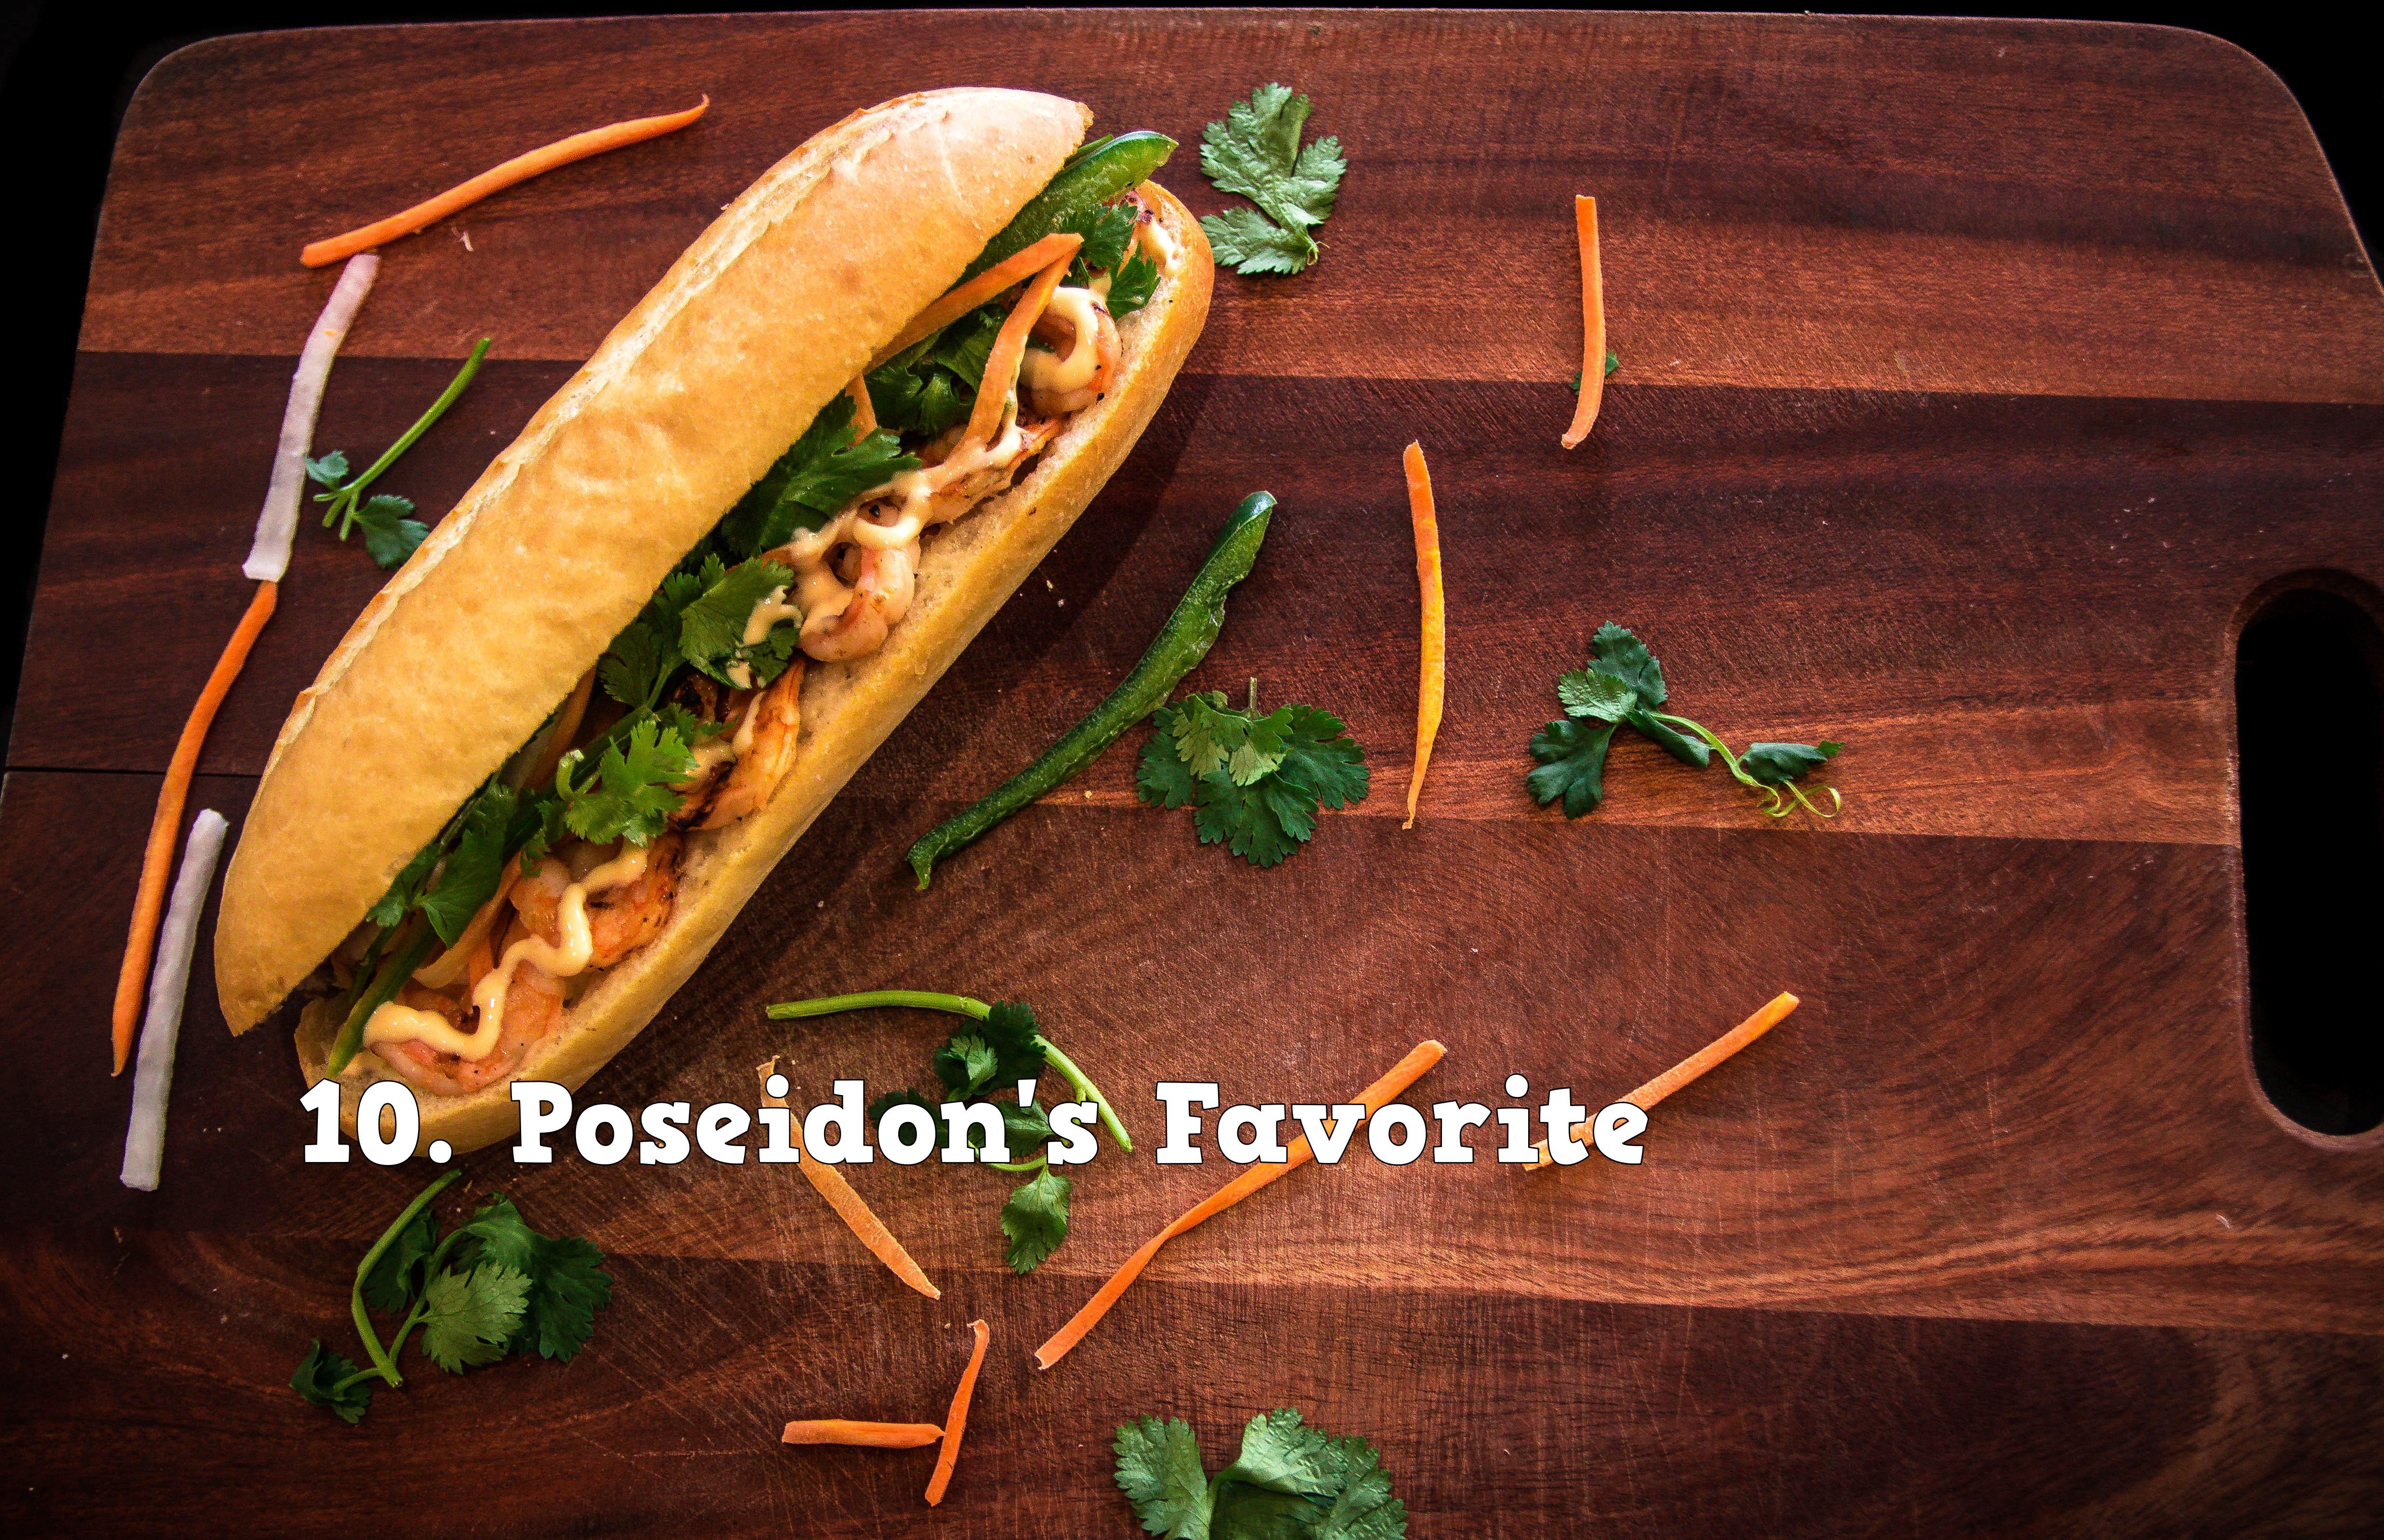 10.Poseidon's Favorite